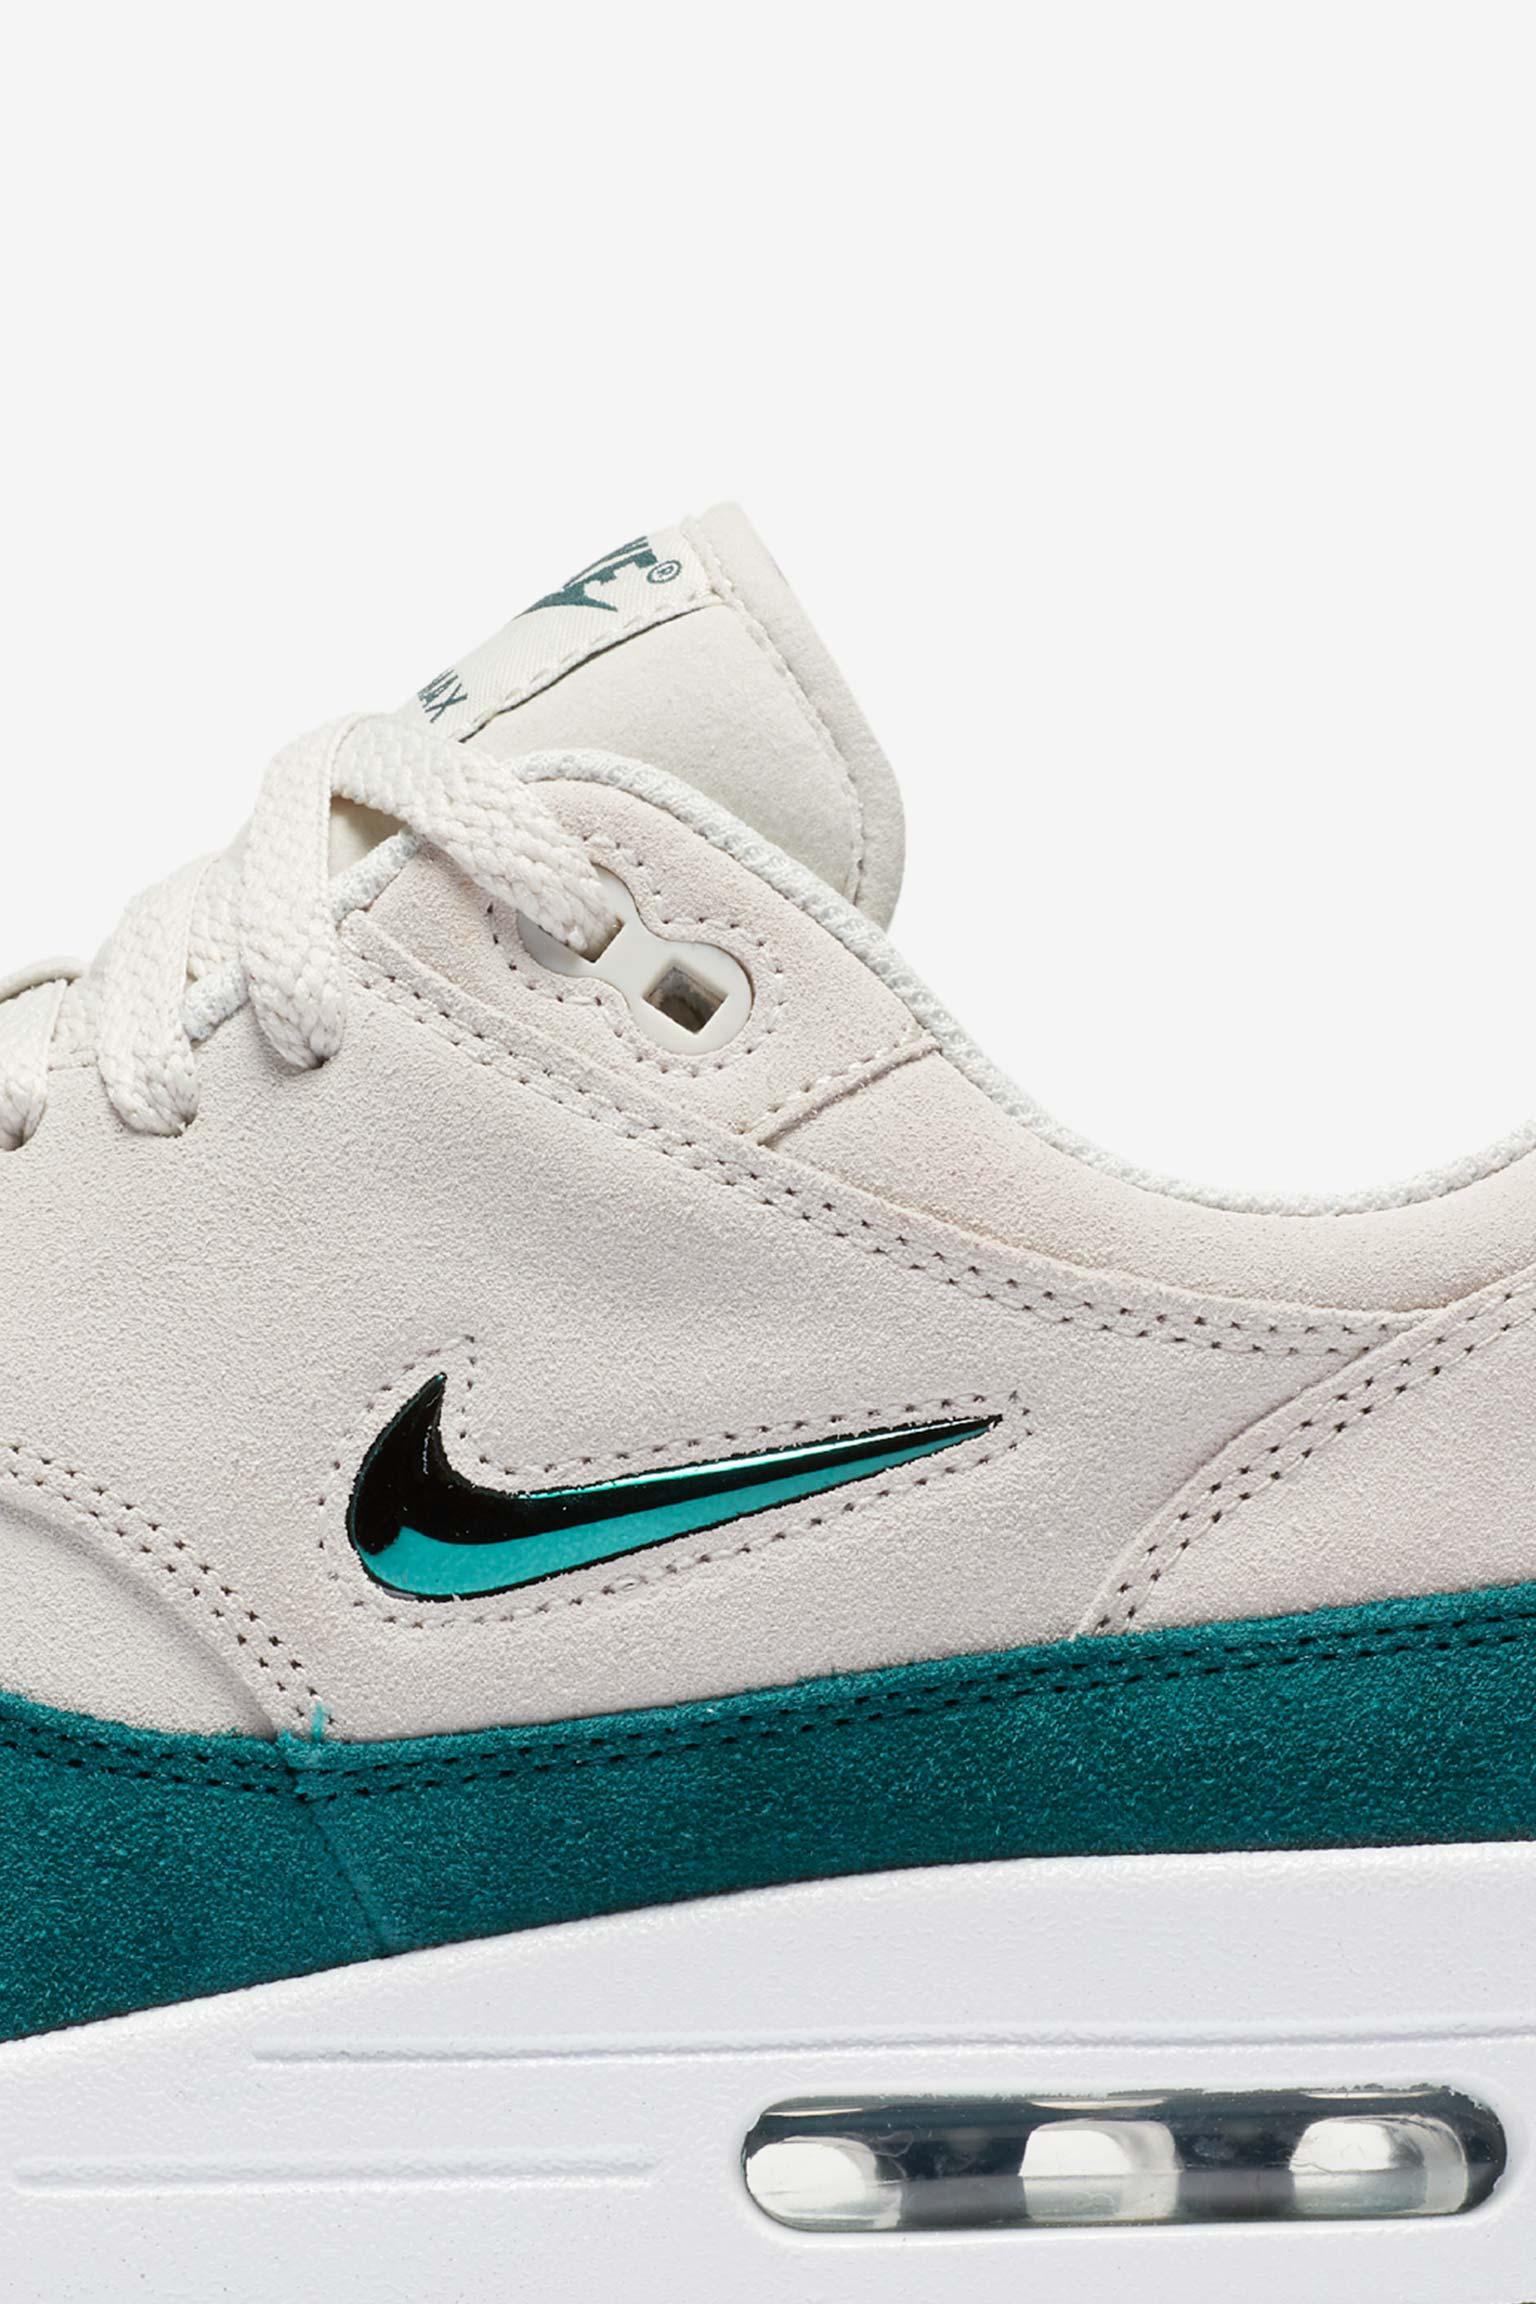 Nike Air Max 1 Premium « Emerald Green ». Nike SNKRS FR